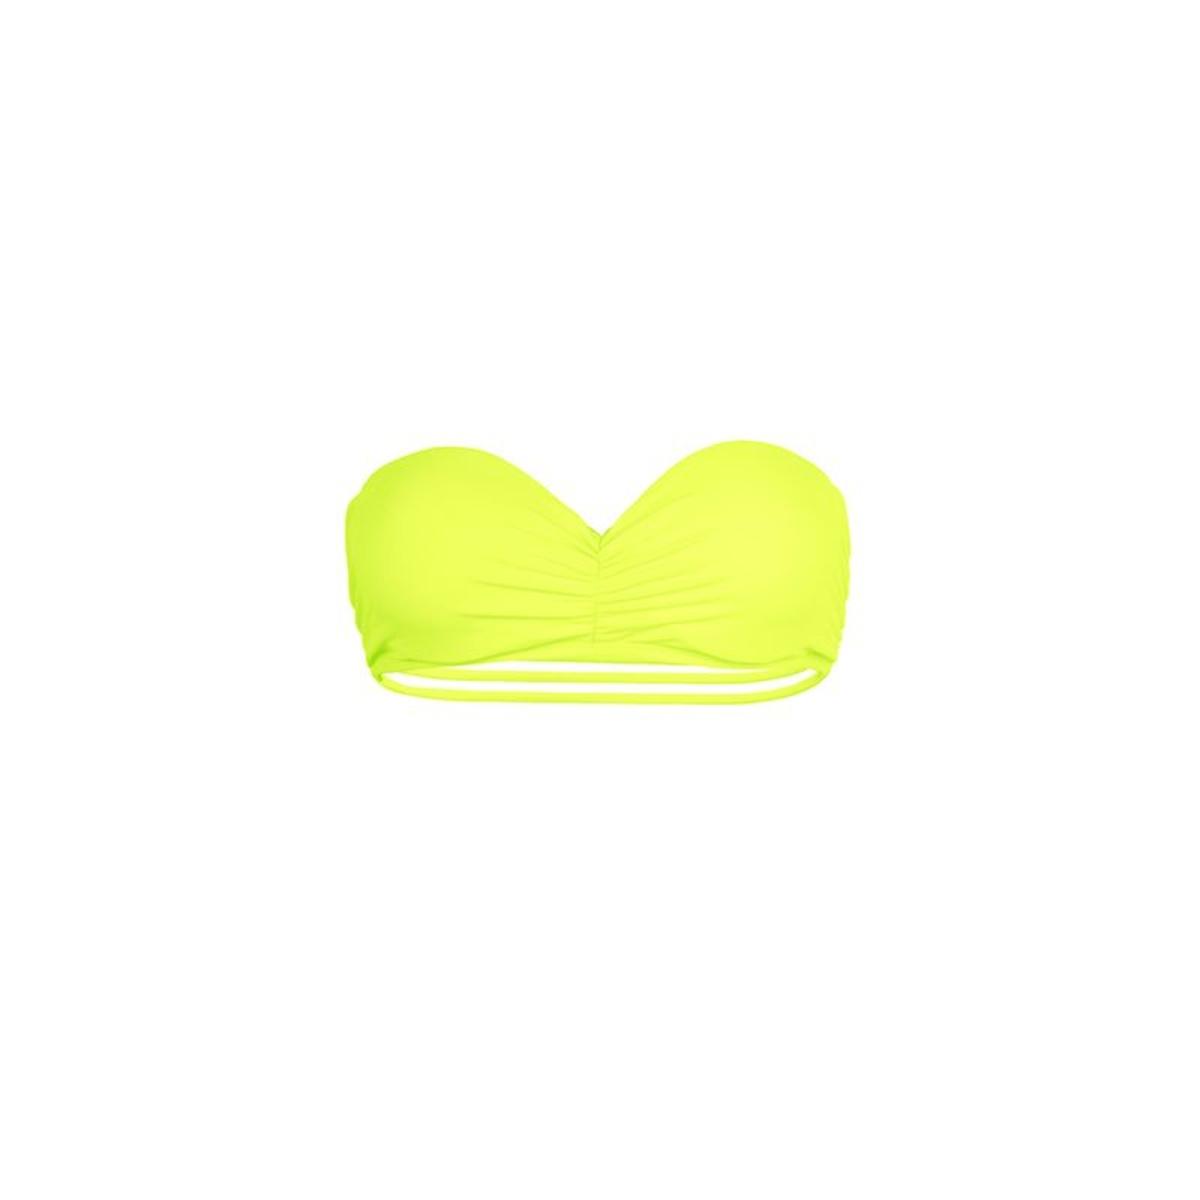 Mon bandeau à liens Teenie Bikini jaune fluo (Haut)